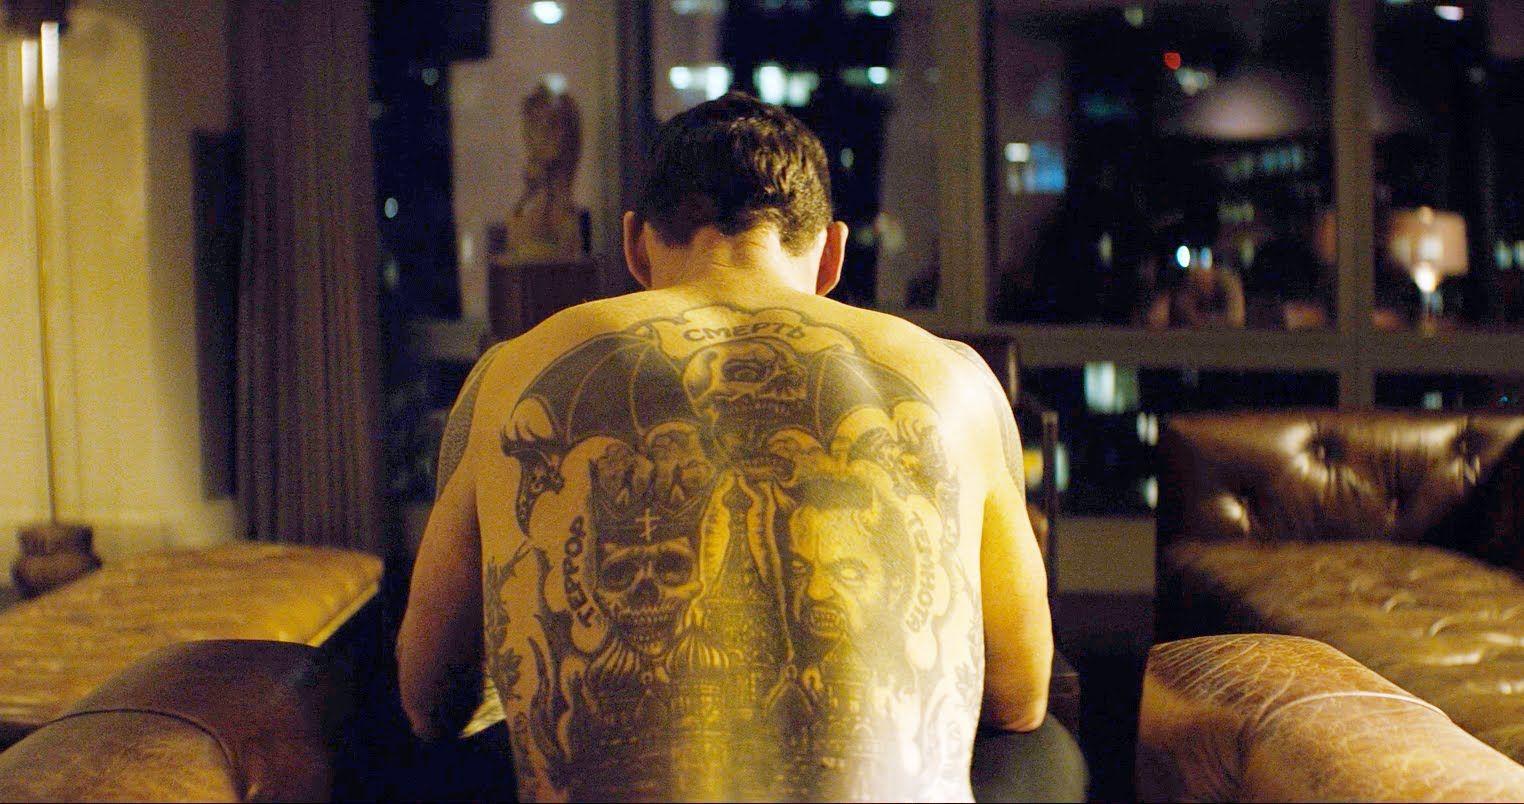 Top 5 Movies About Russian Mafia Mafia Mafia Crime Movies